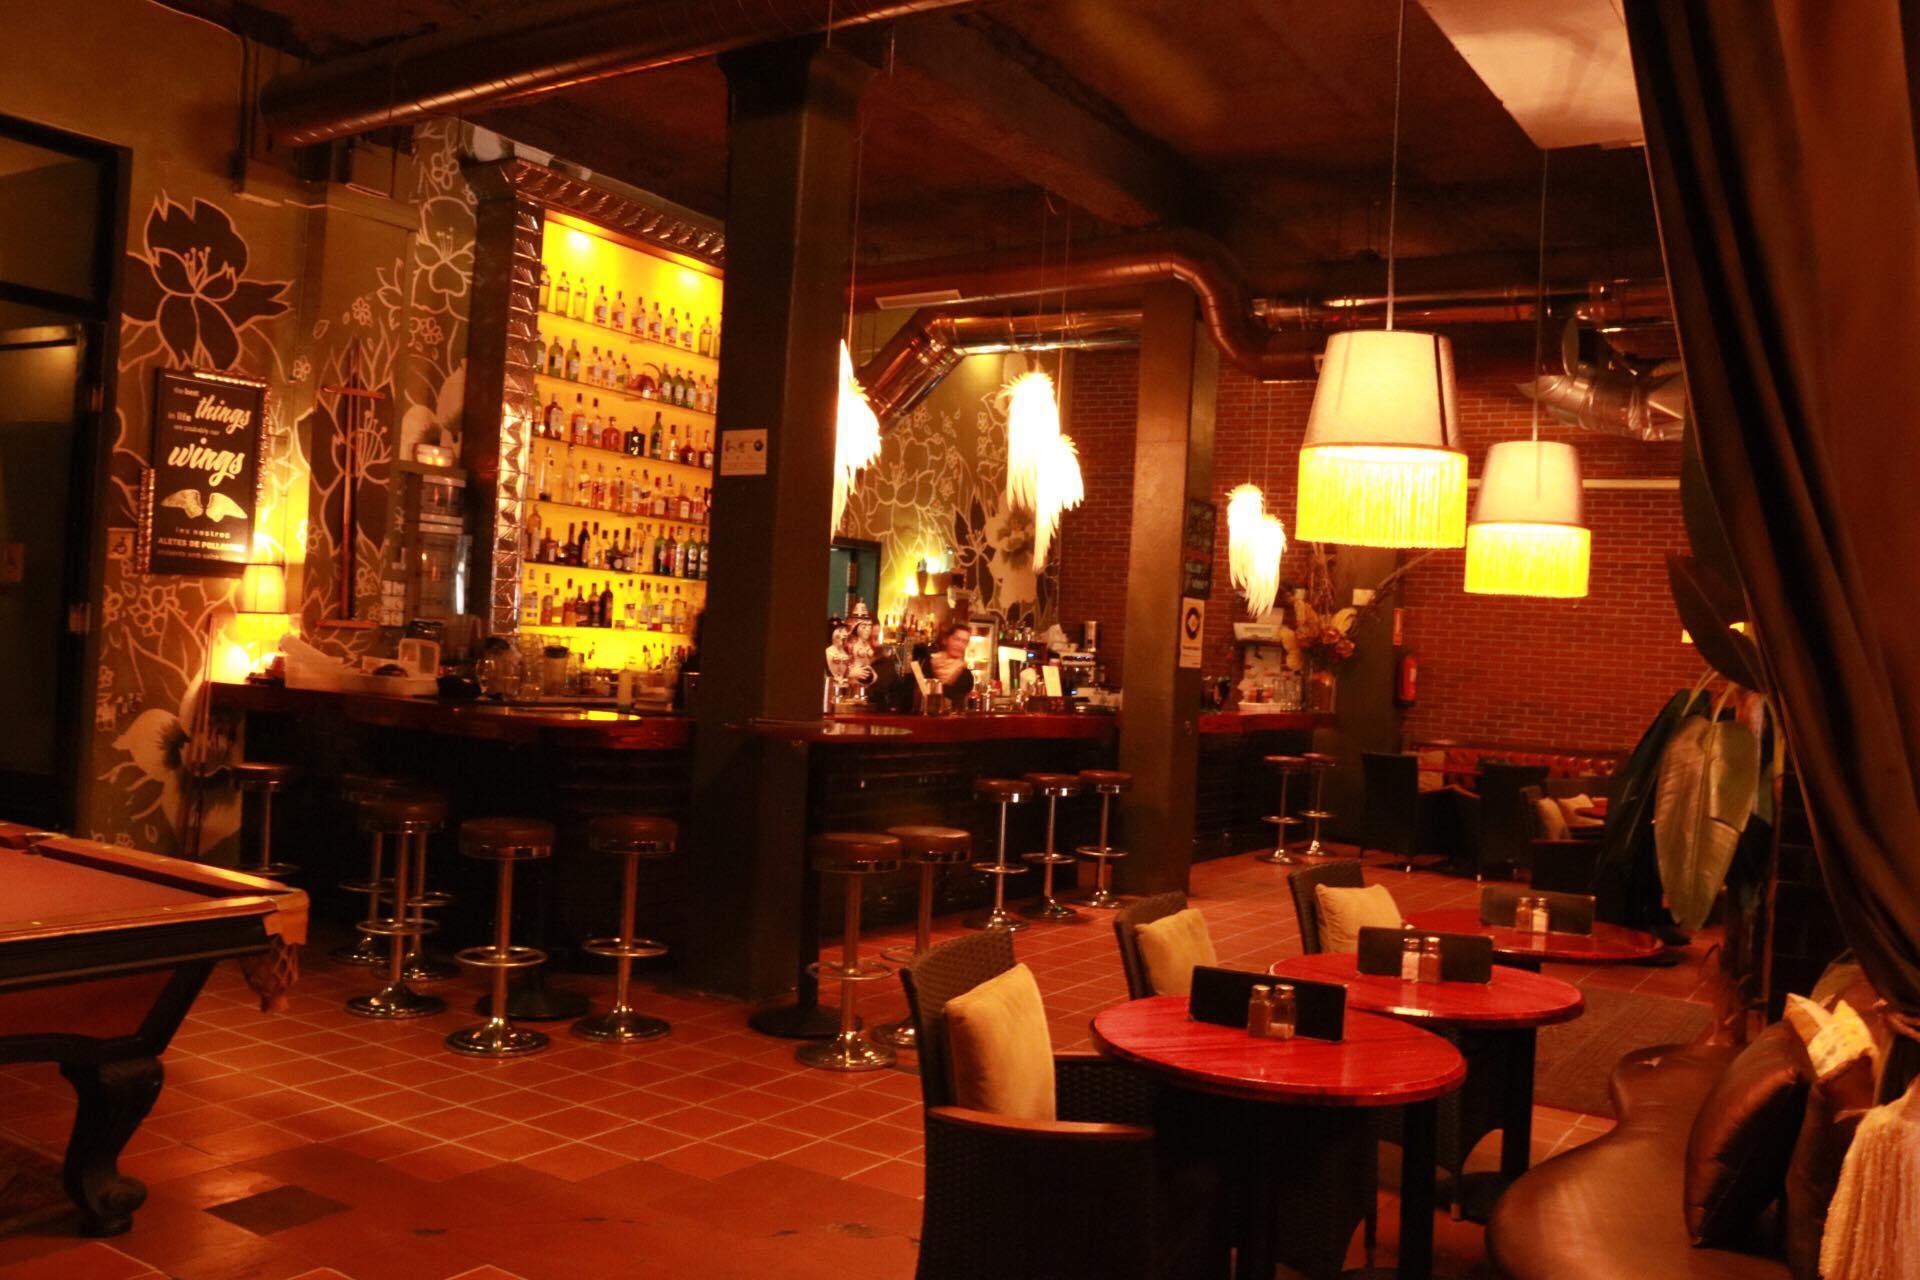 Marmalade Restaurant & Bar